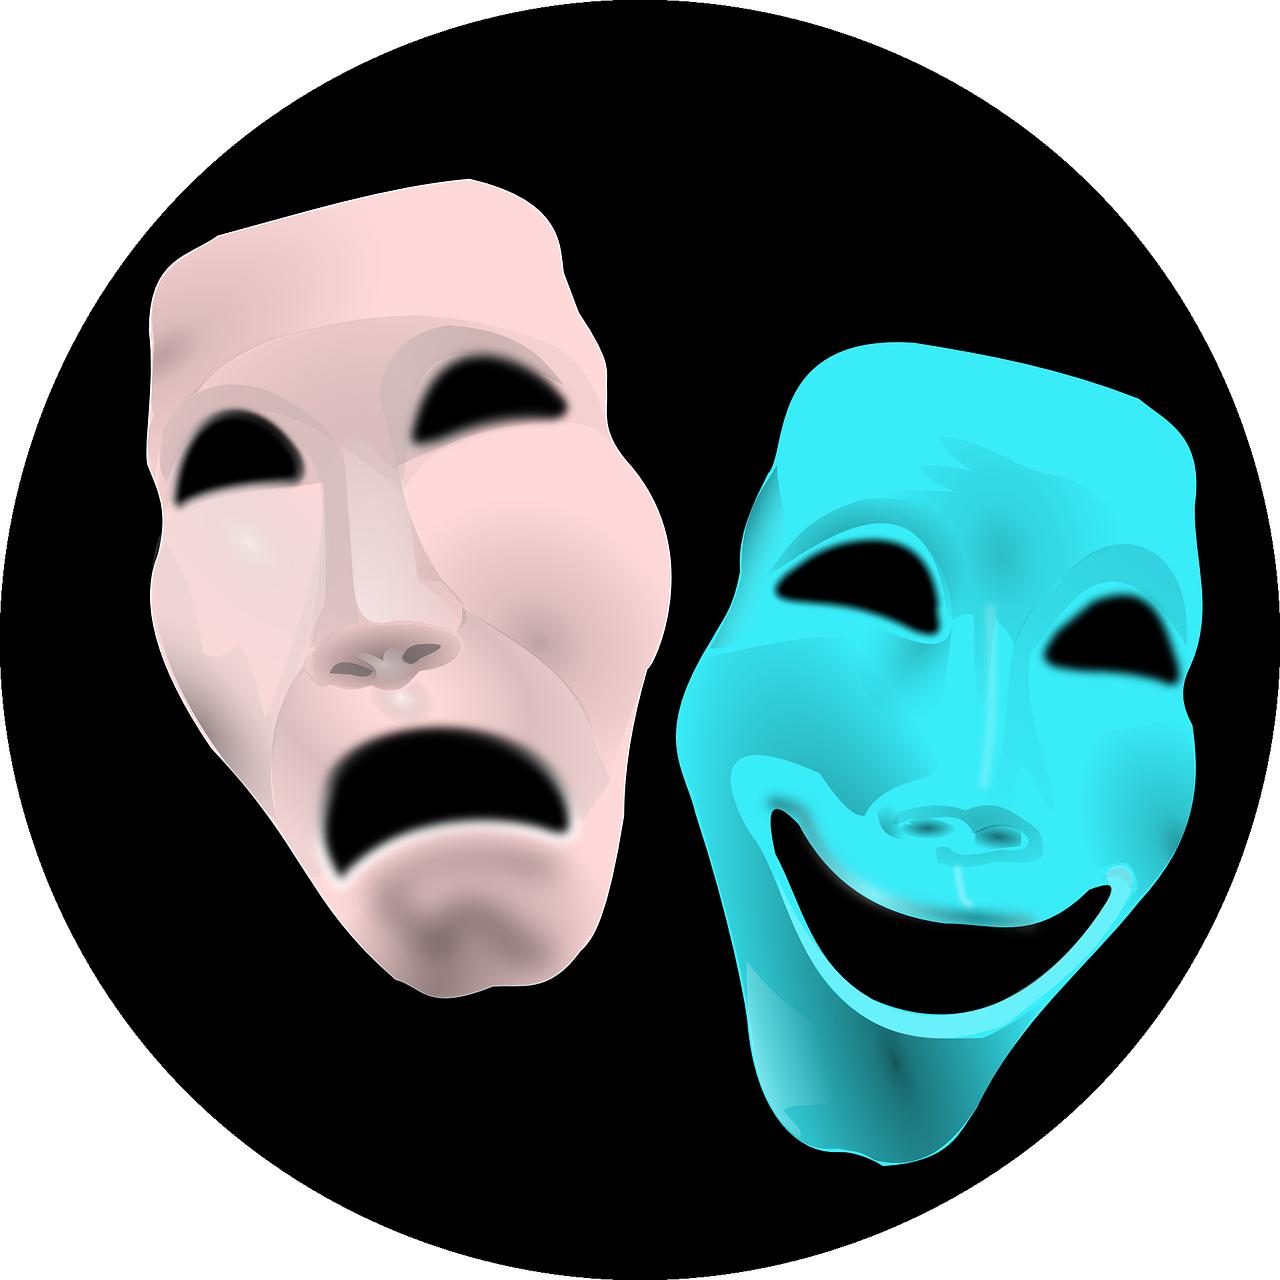 bipolar disorder comedy tragedy masks